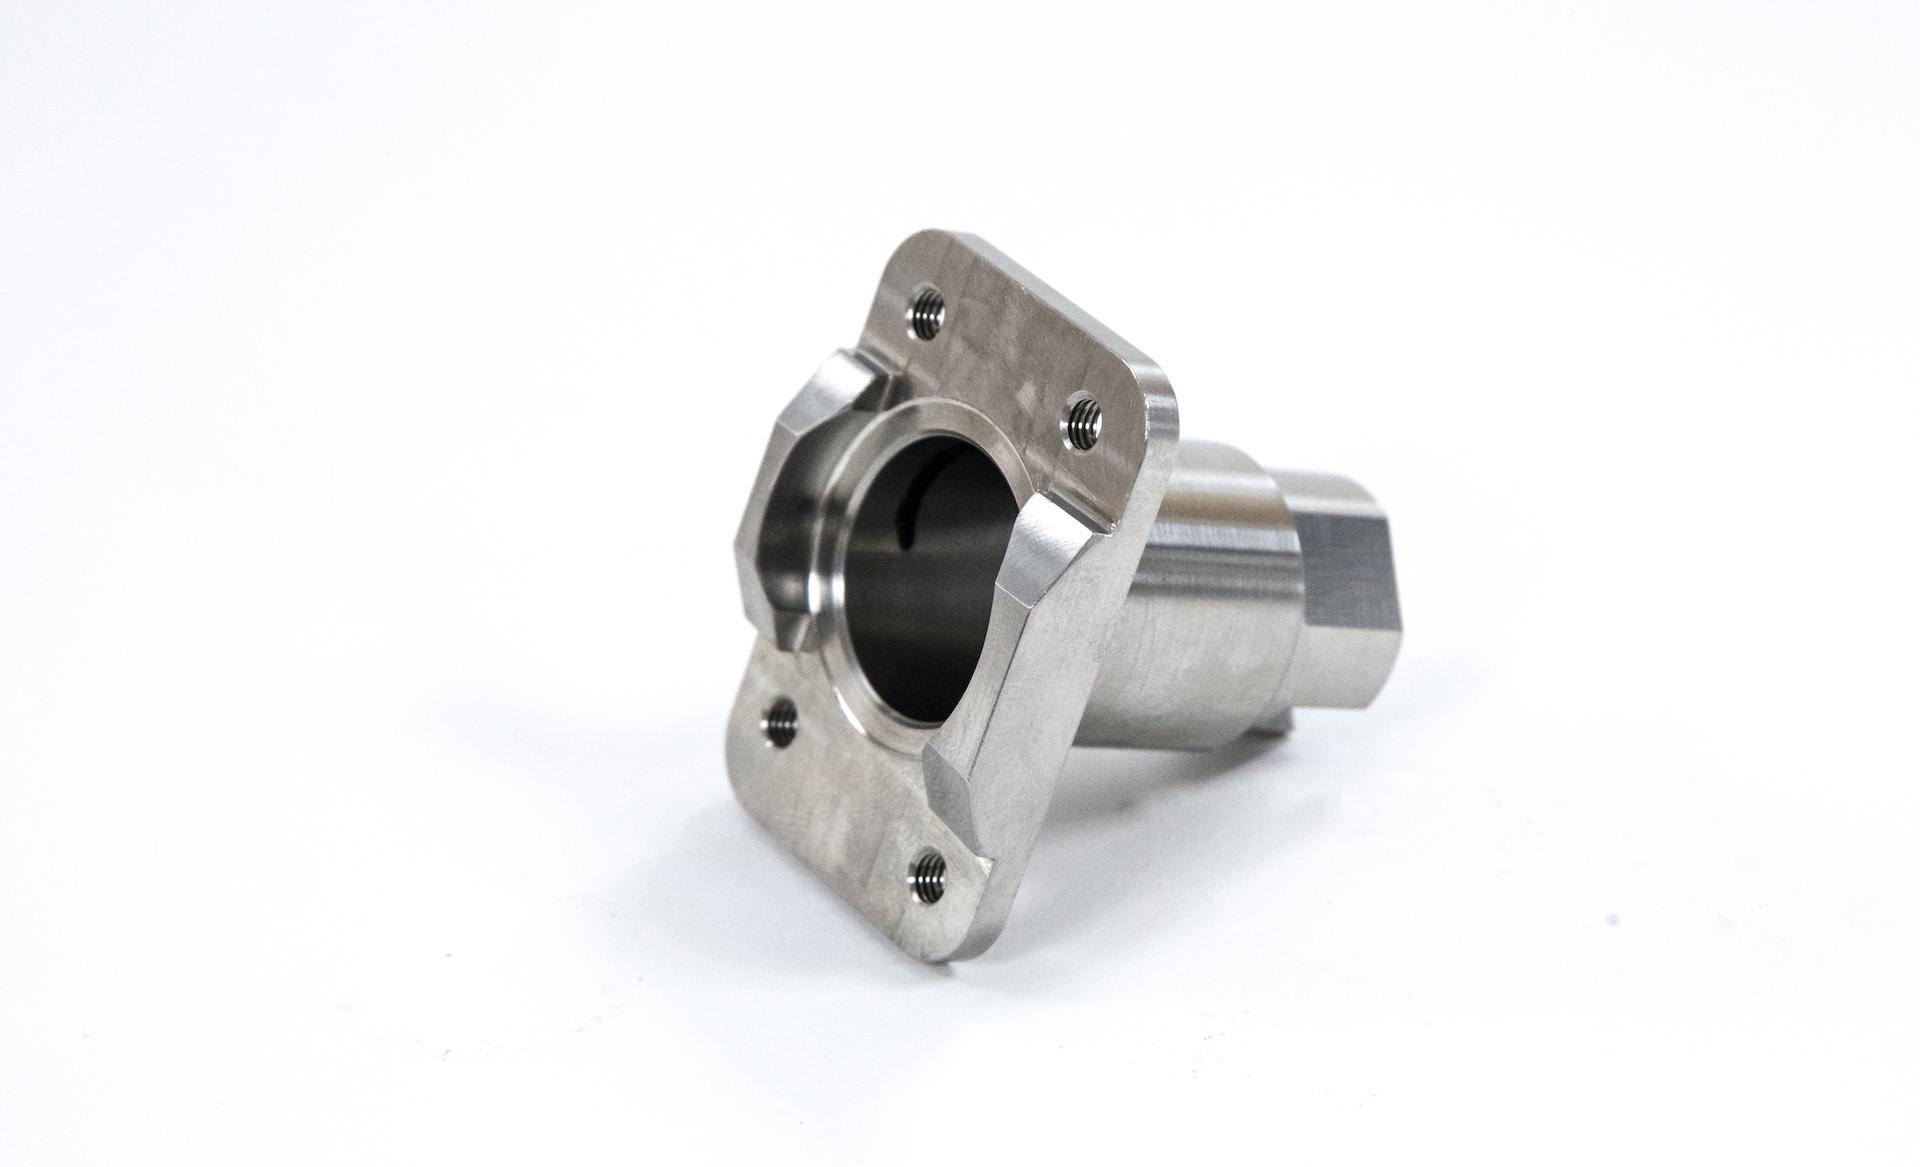 https://www.taylor-engineering.co.uk/wp-content/uploads/capabilities/milling/hurco-part.jpg